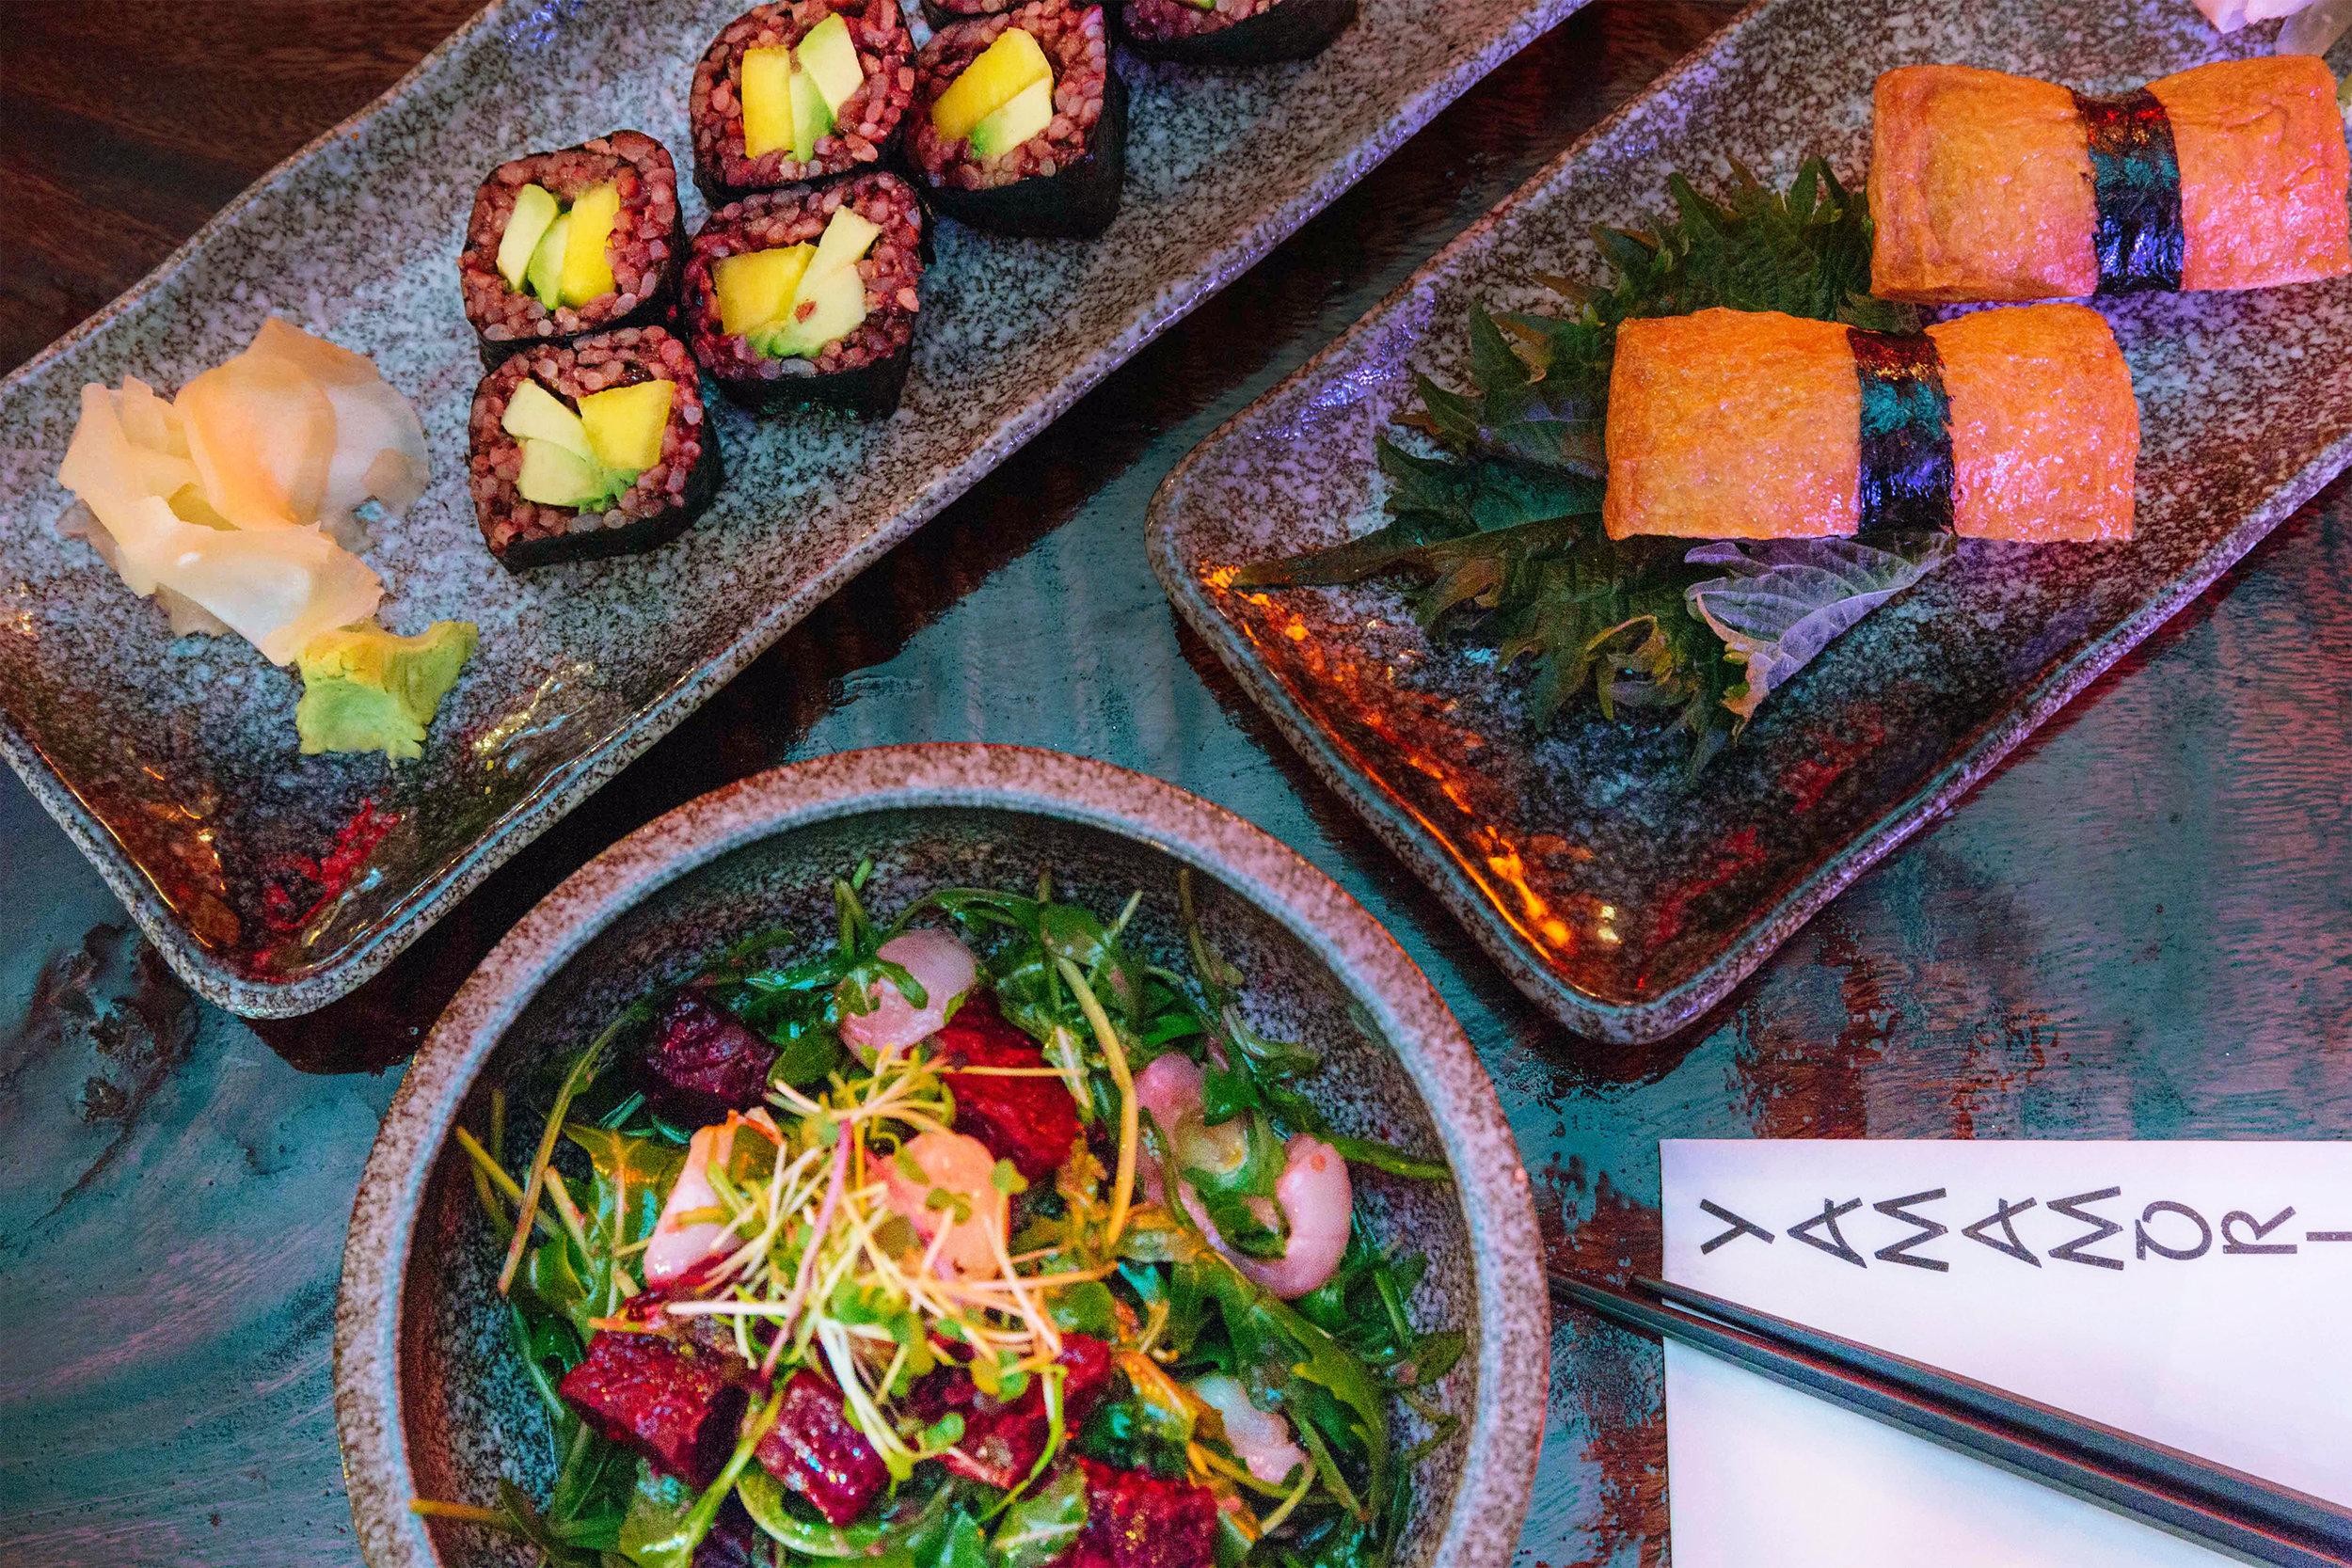 Clockwise from top left: Avocado and Mango Nori roll, Inari Nigiri, and Beetroot and Lychee Salad